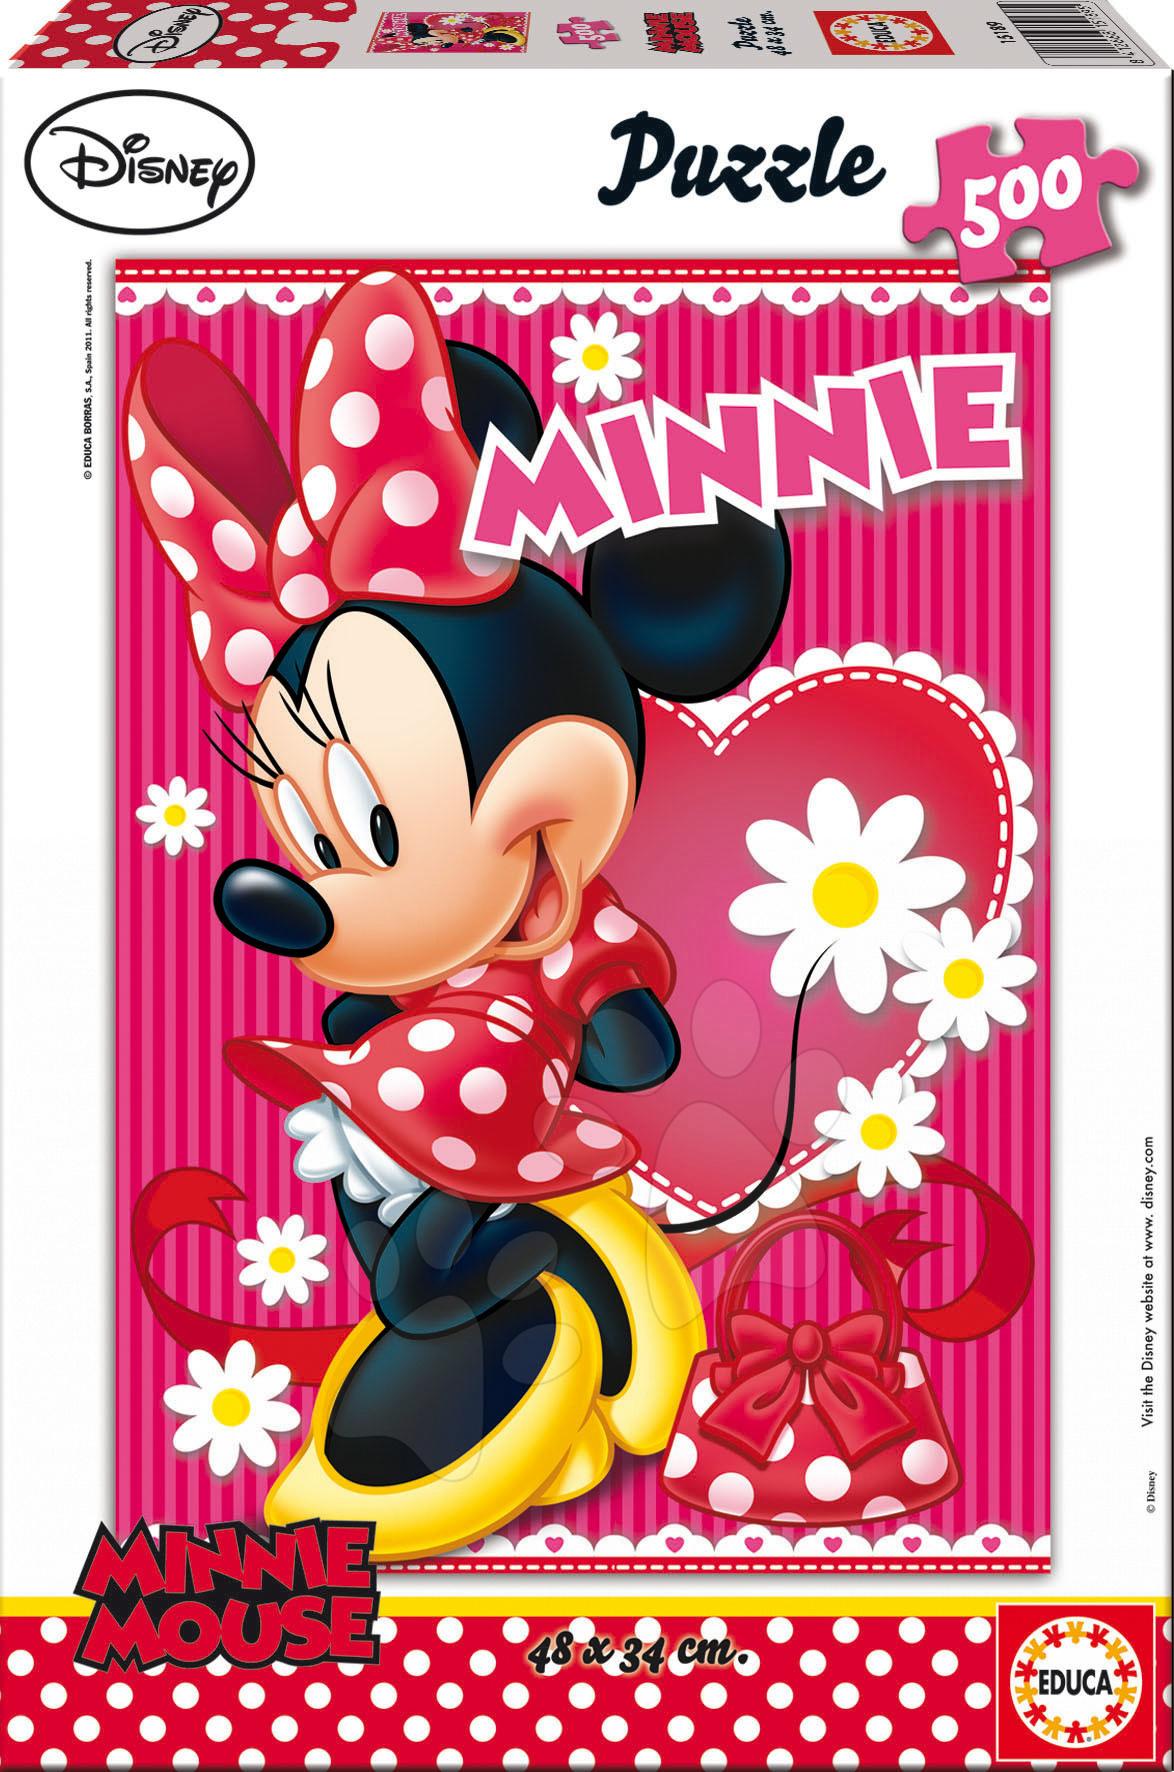 Puzzle Disney Rodina Minnie Mouse Educa 500 dílů od 11 let